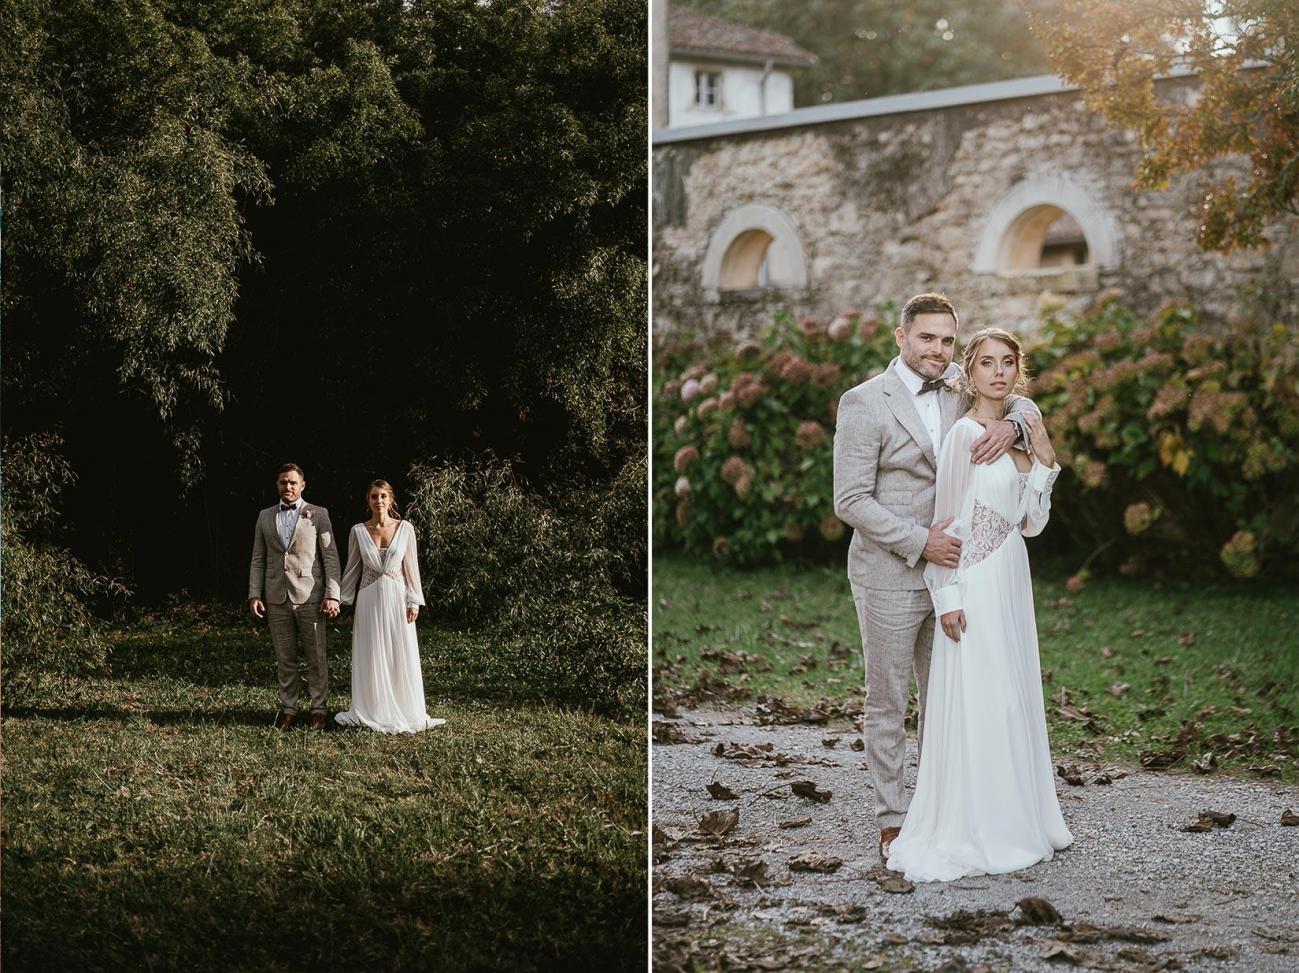 Mariage landes photographe inspiration elopement rustique wedding 88